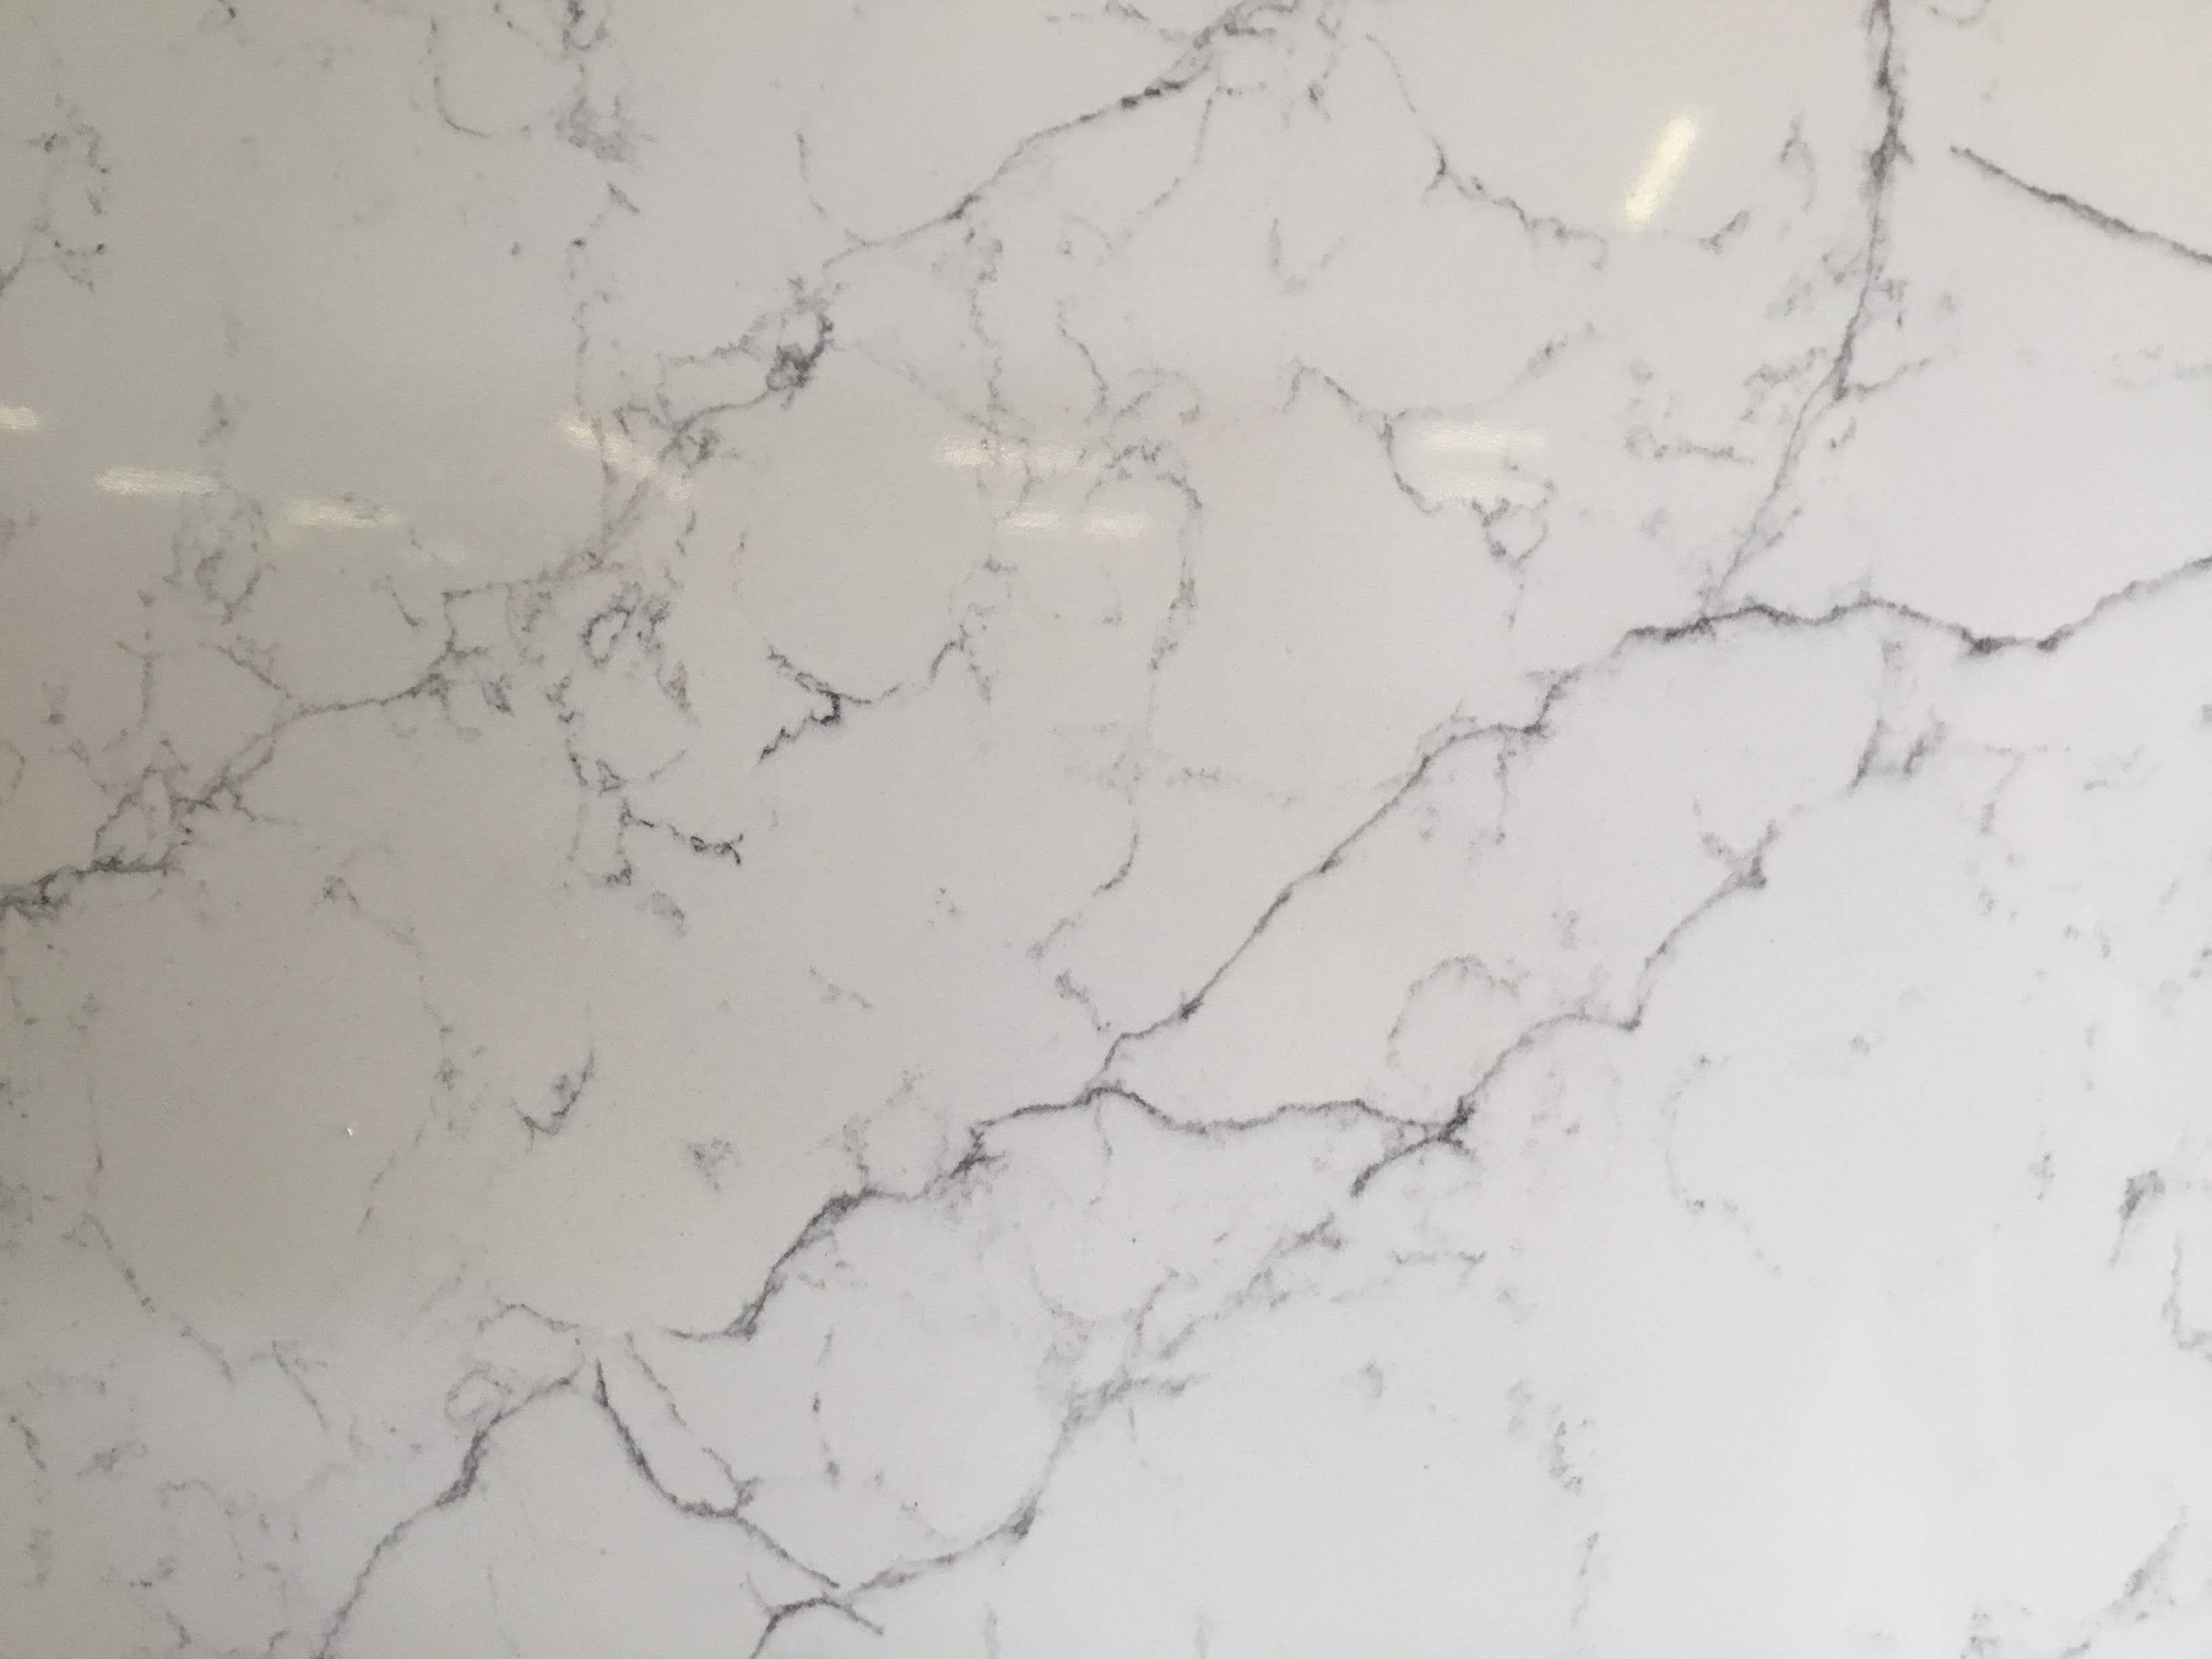 Alaska Bianca Cq 3cm Seattle Wa In 2020 Cosmos Granite Quartz Slab Granite Slab